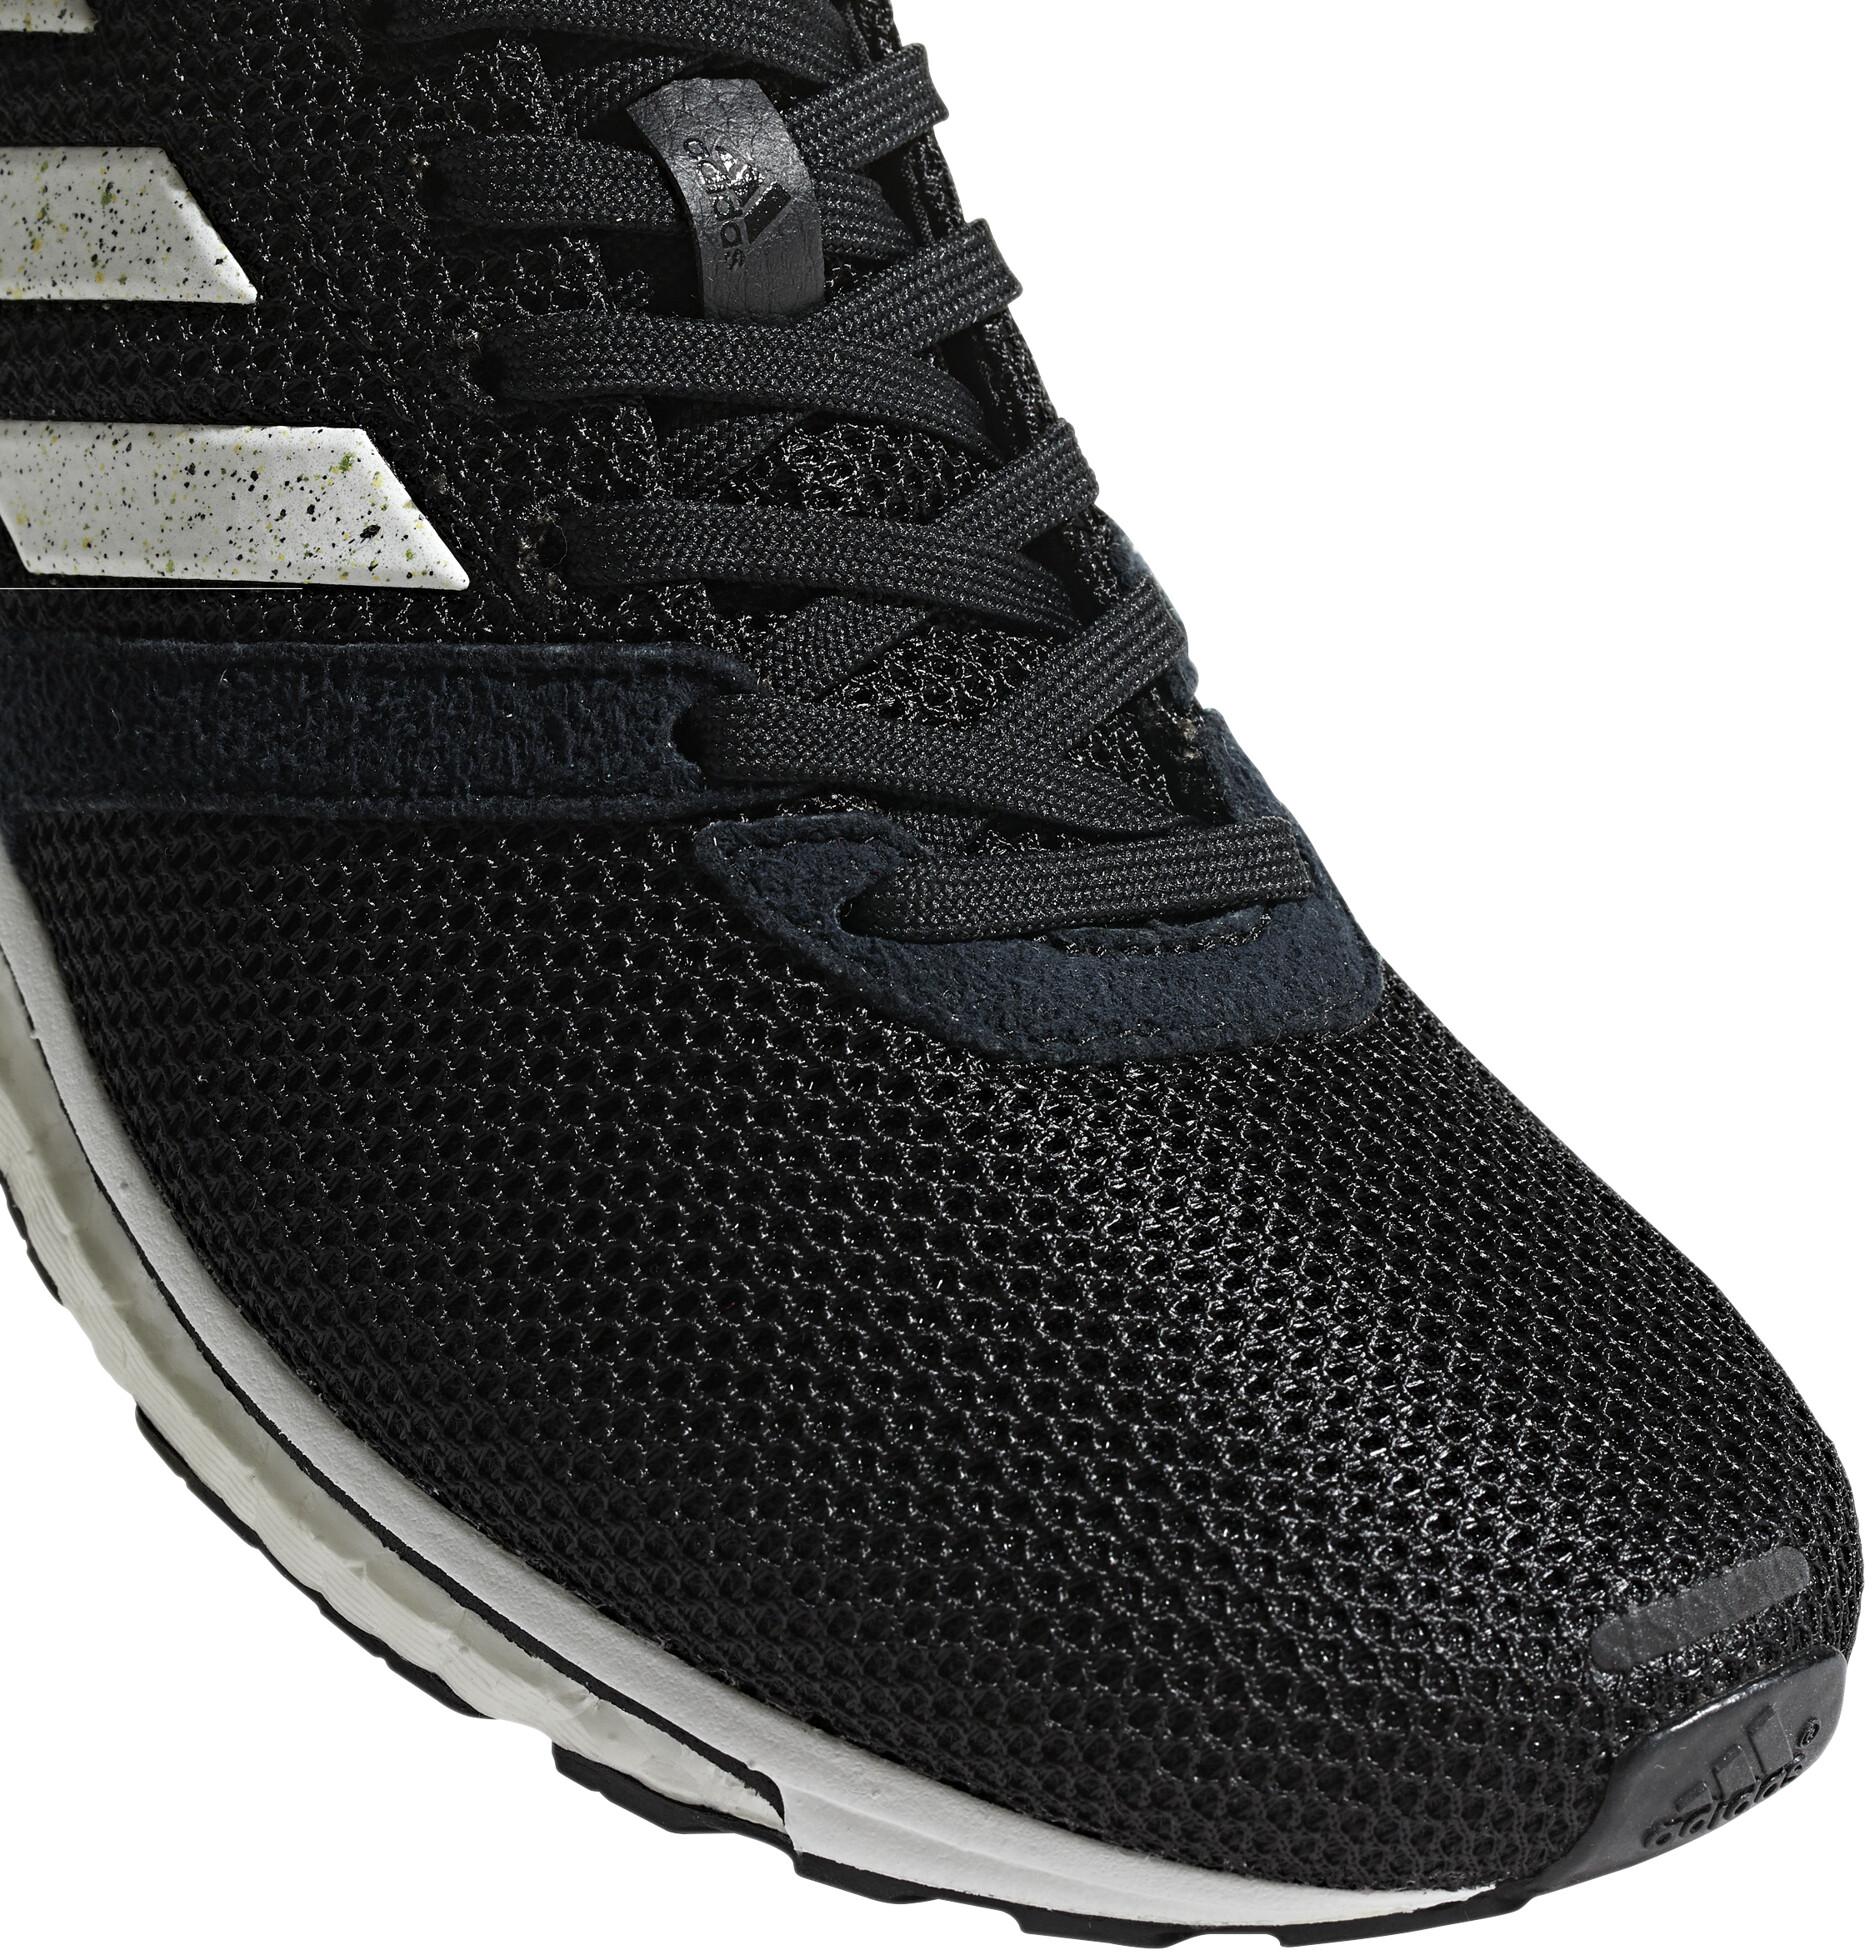 finest selection 19f98 a83a4 adidas Adizero Adios 4 Running Shoes Women black